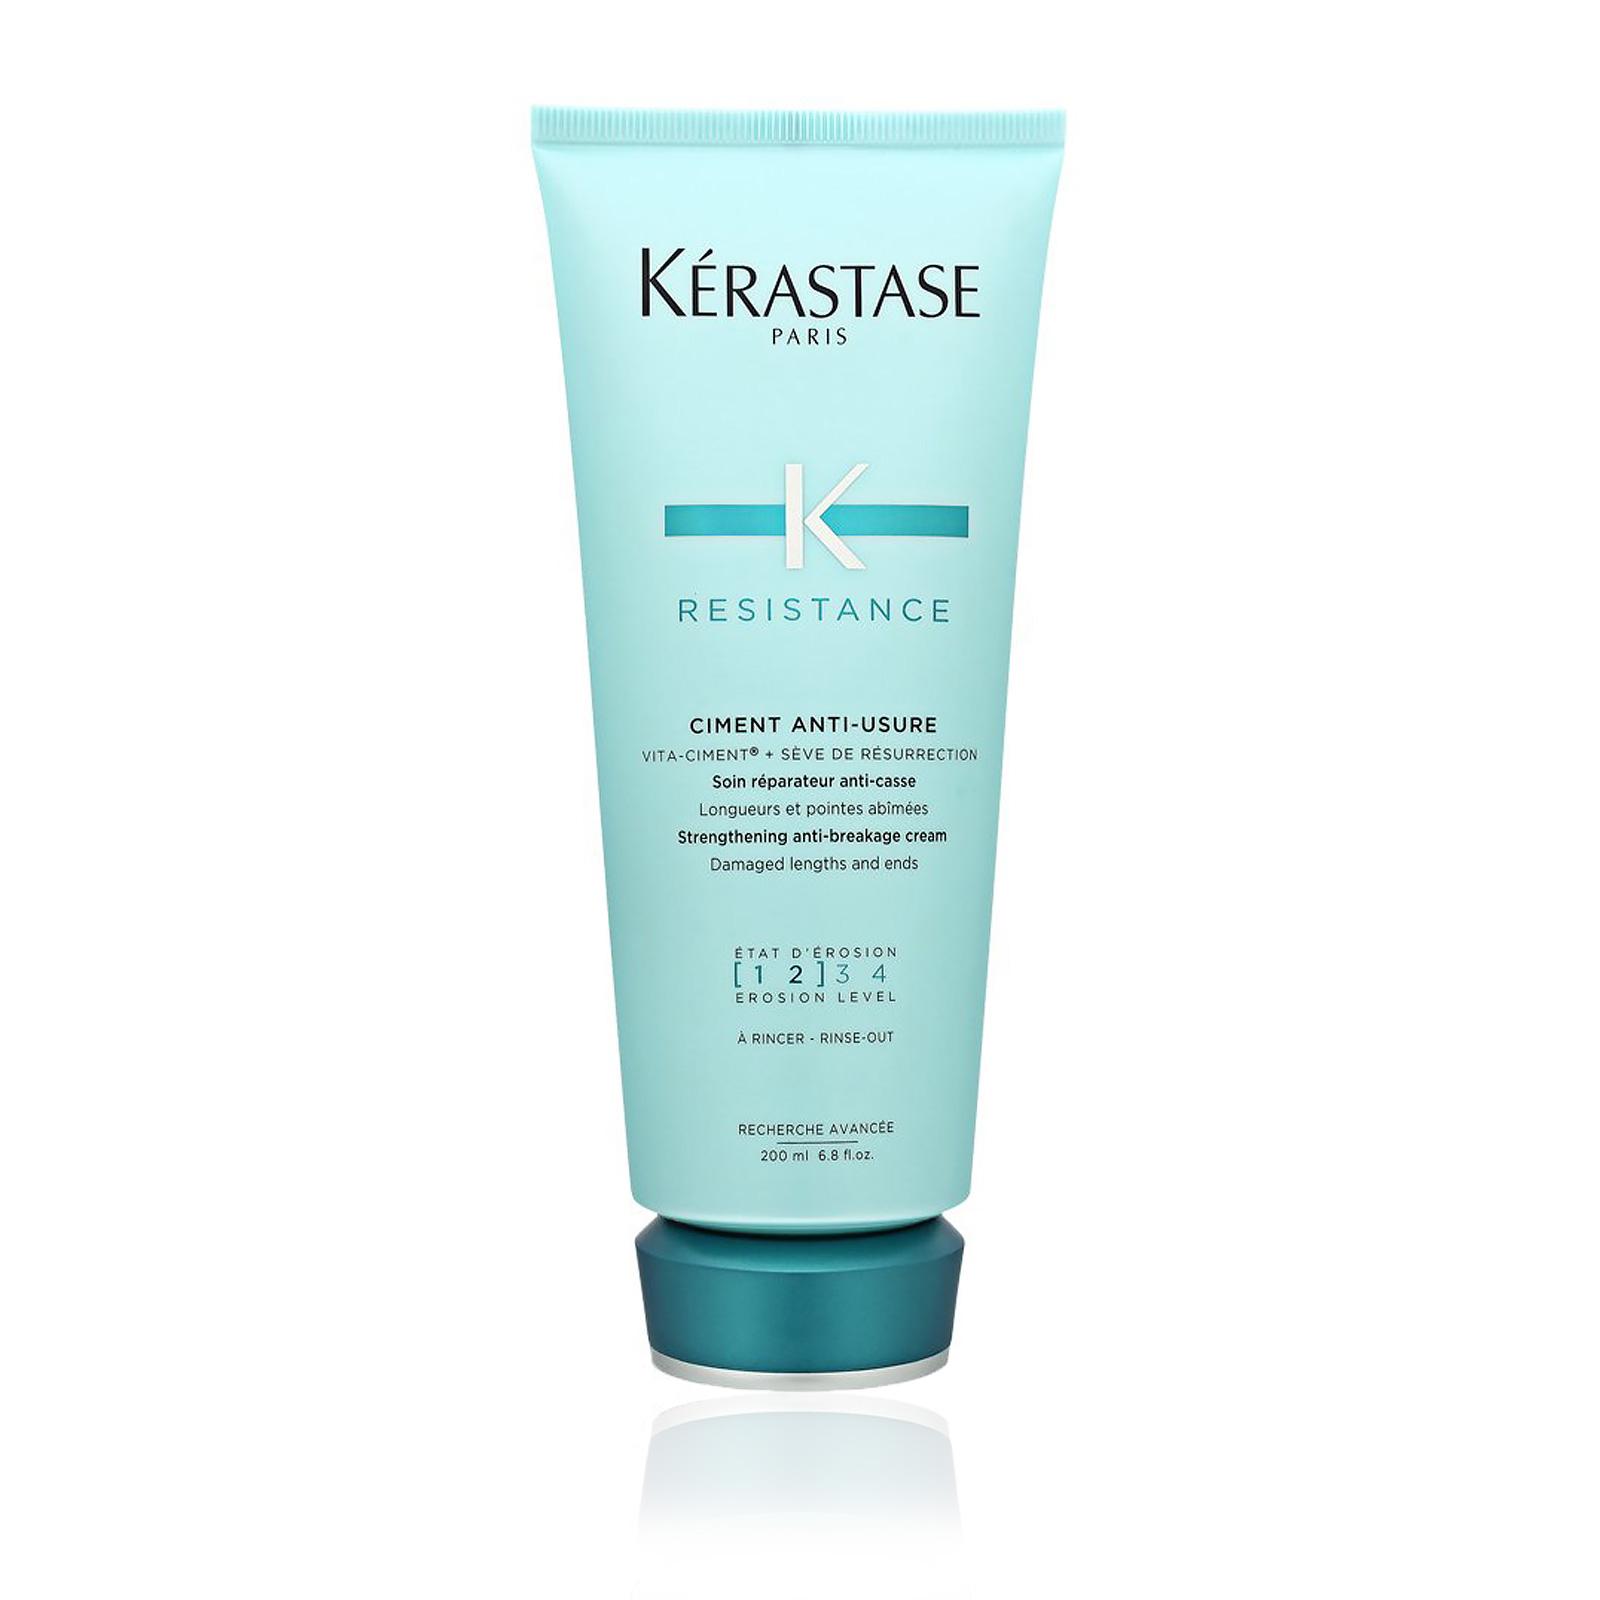 Resistance Ciment Anti-Usure Strengthening Anti-Breakage Cream (Damaged Lengths & Ends)